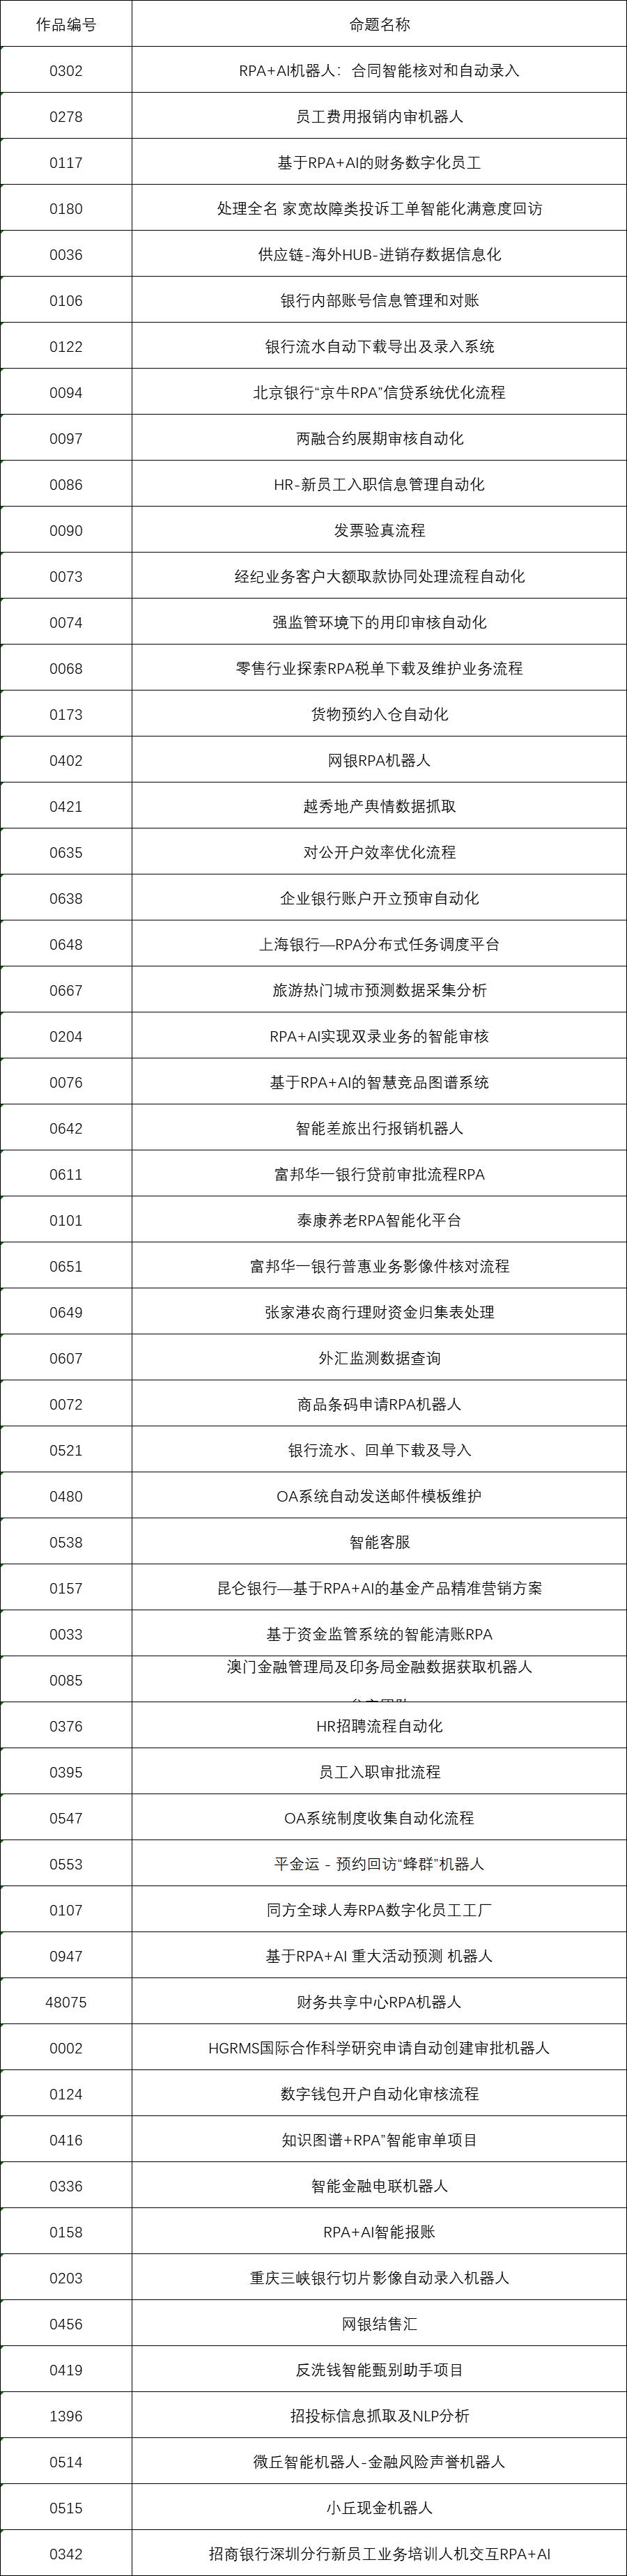 企业组名单.png